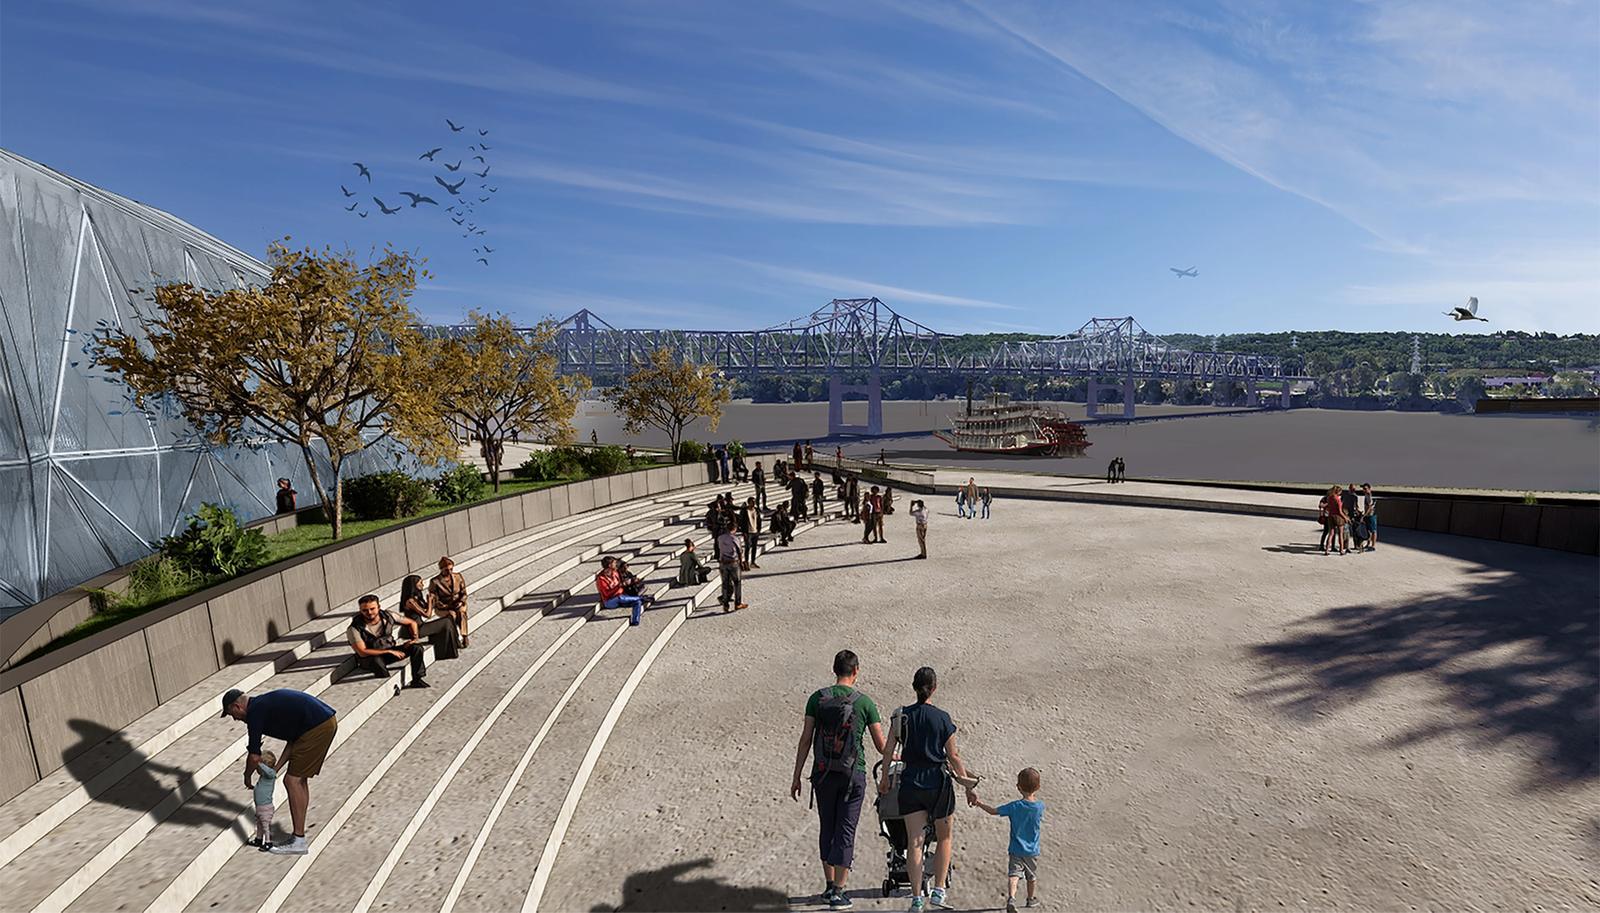 View Toward River at Amphitheater